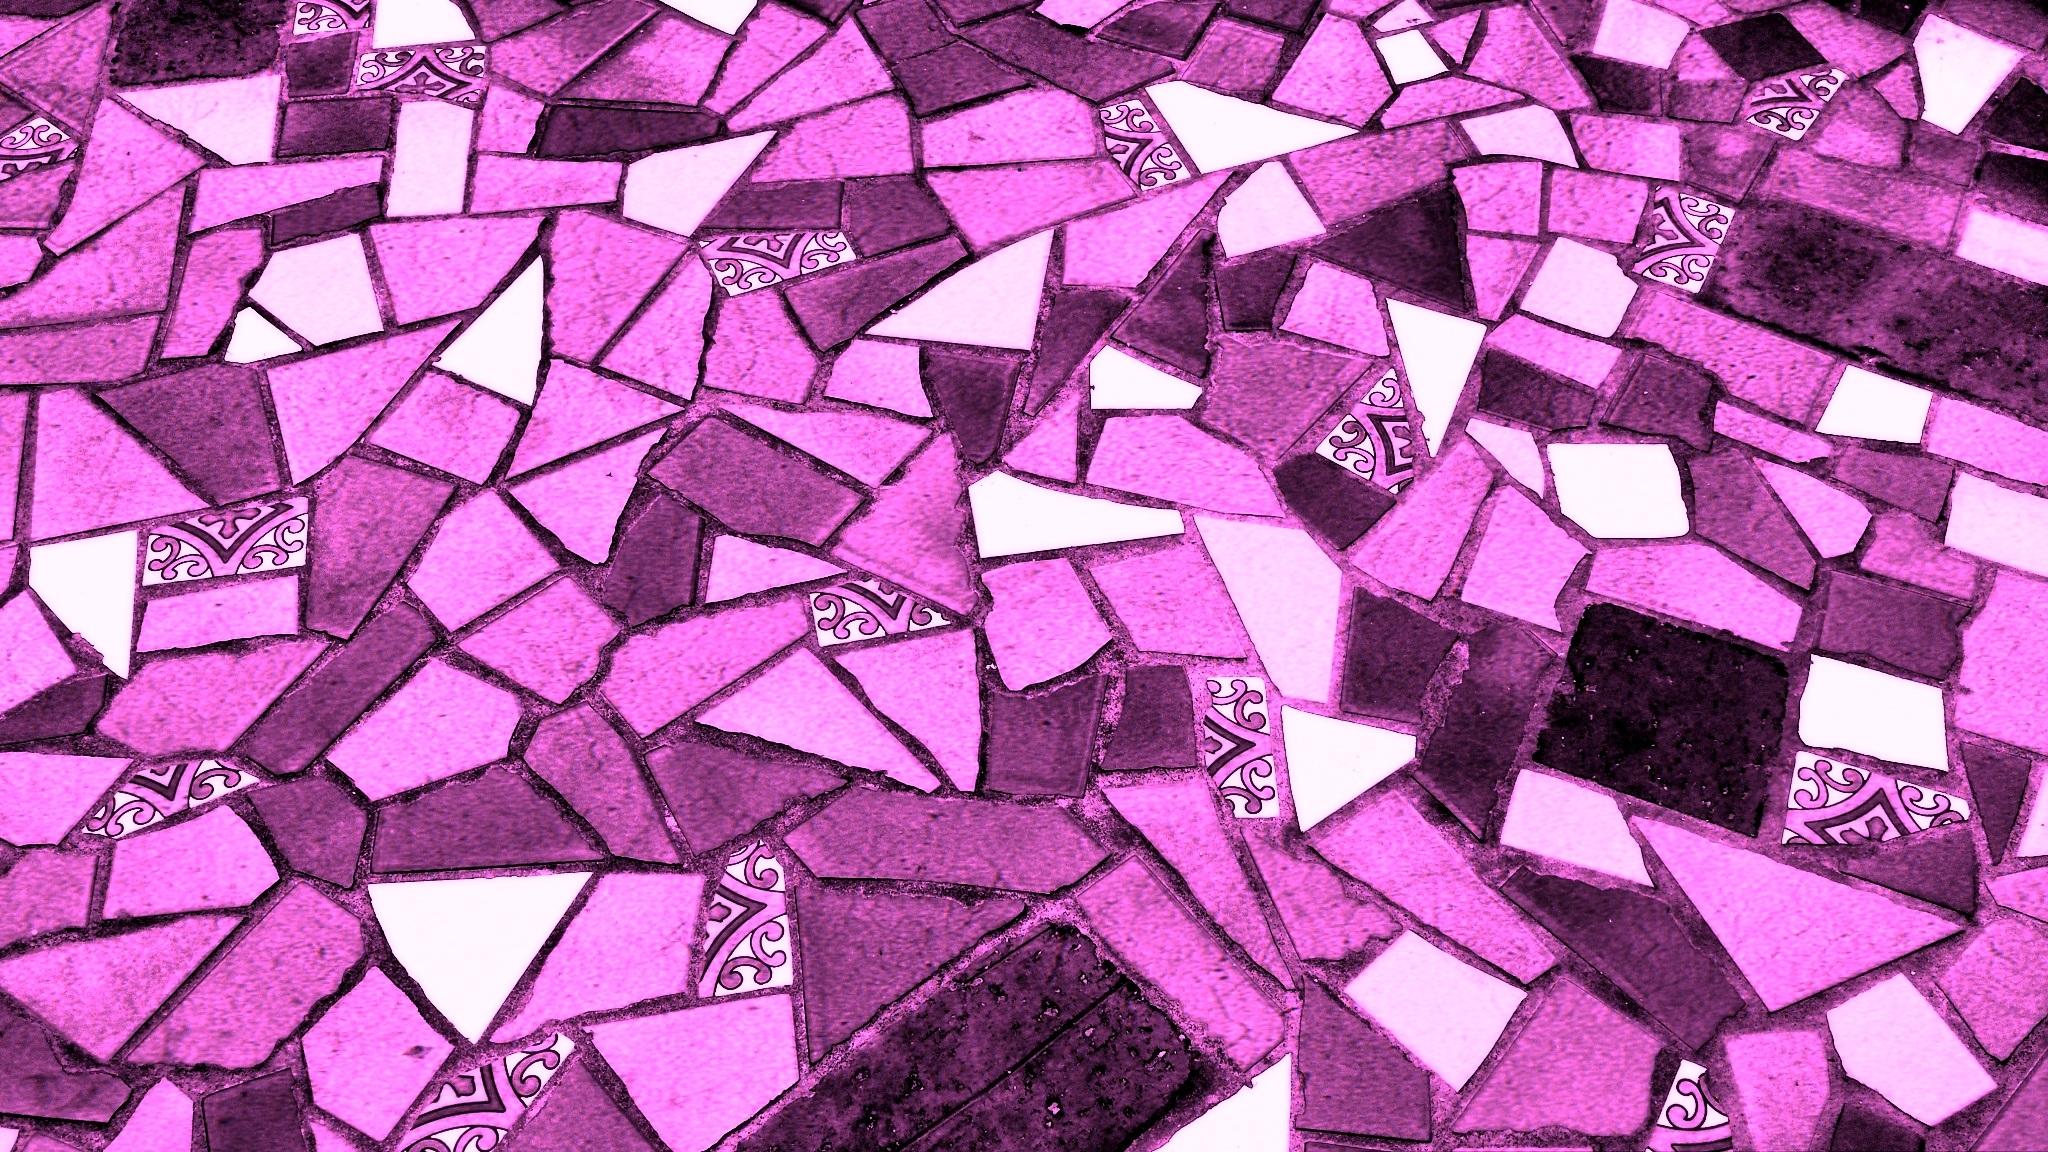 Vintage Retro Texture Purple Petal Interior Old Home Wall Decoration Construction Pattern Line Geometric Color Natural Square Paint